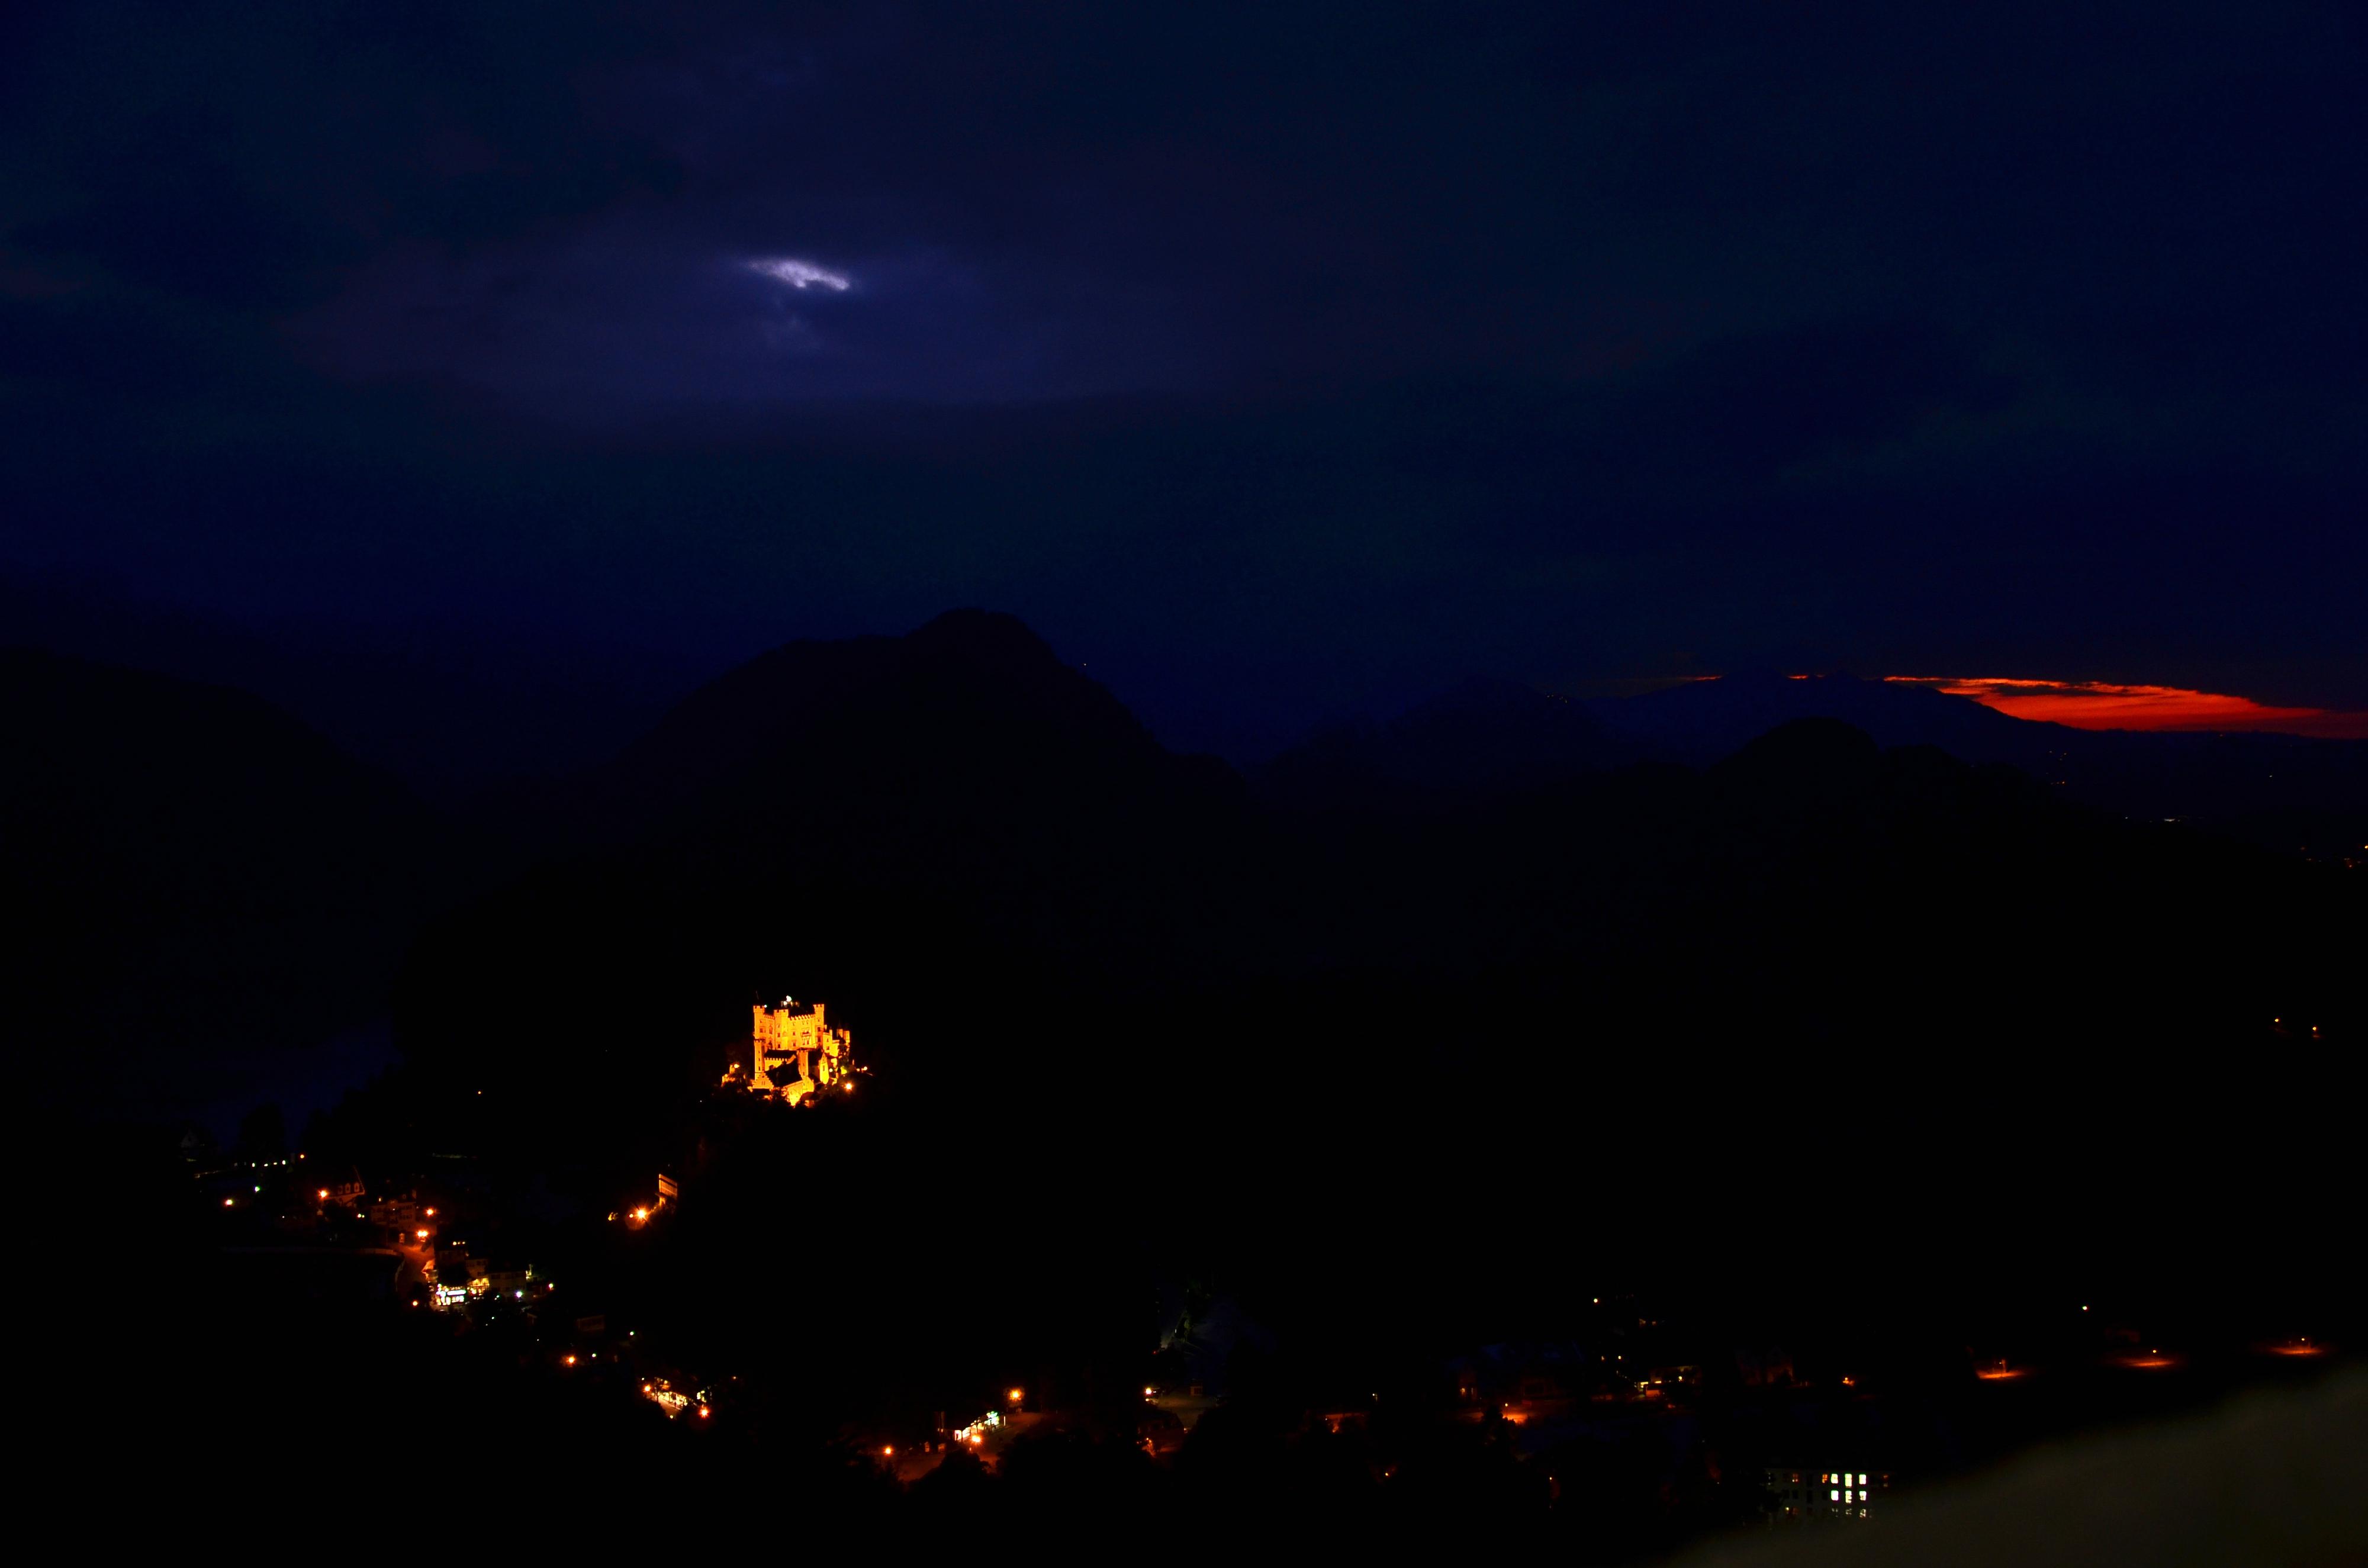 B0078 Schloss Neuschwanstein Nacht Blick auf Hohenschwangau.jpg